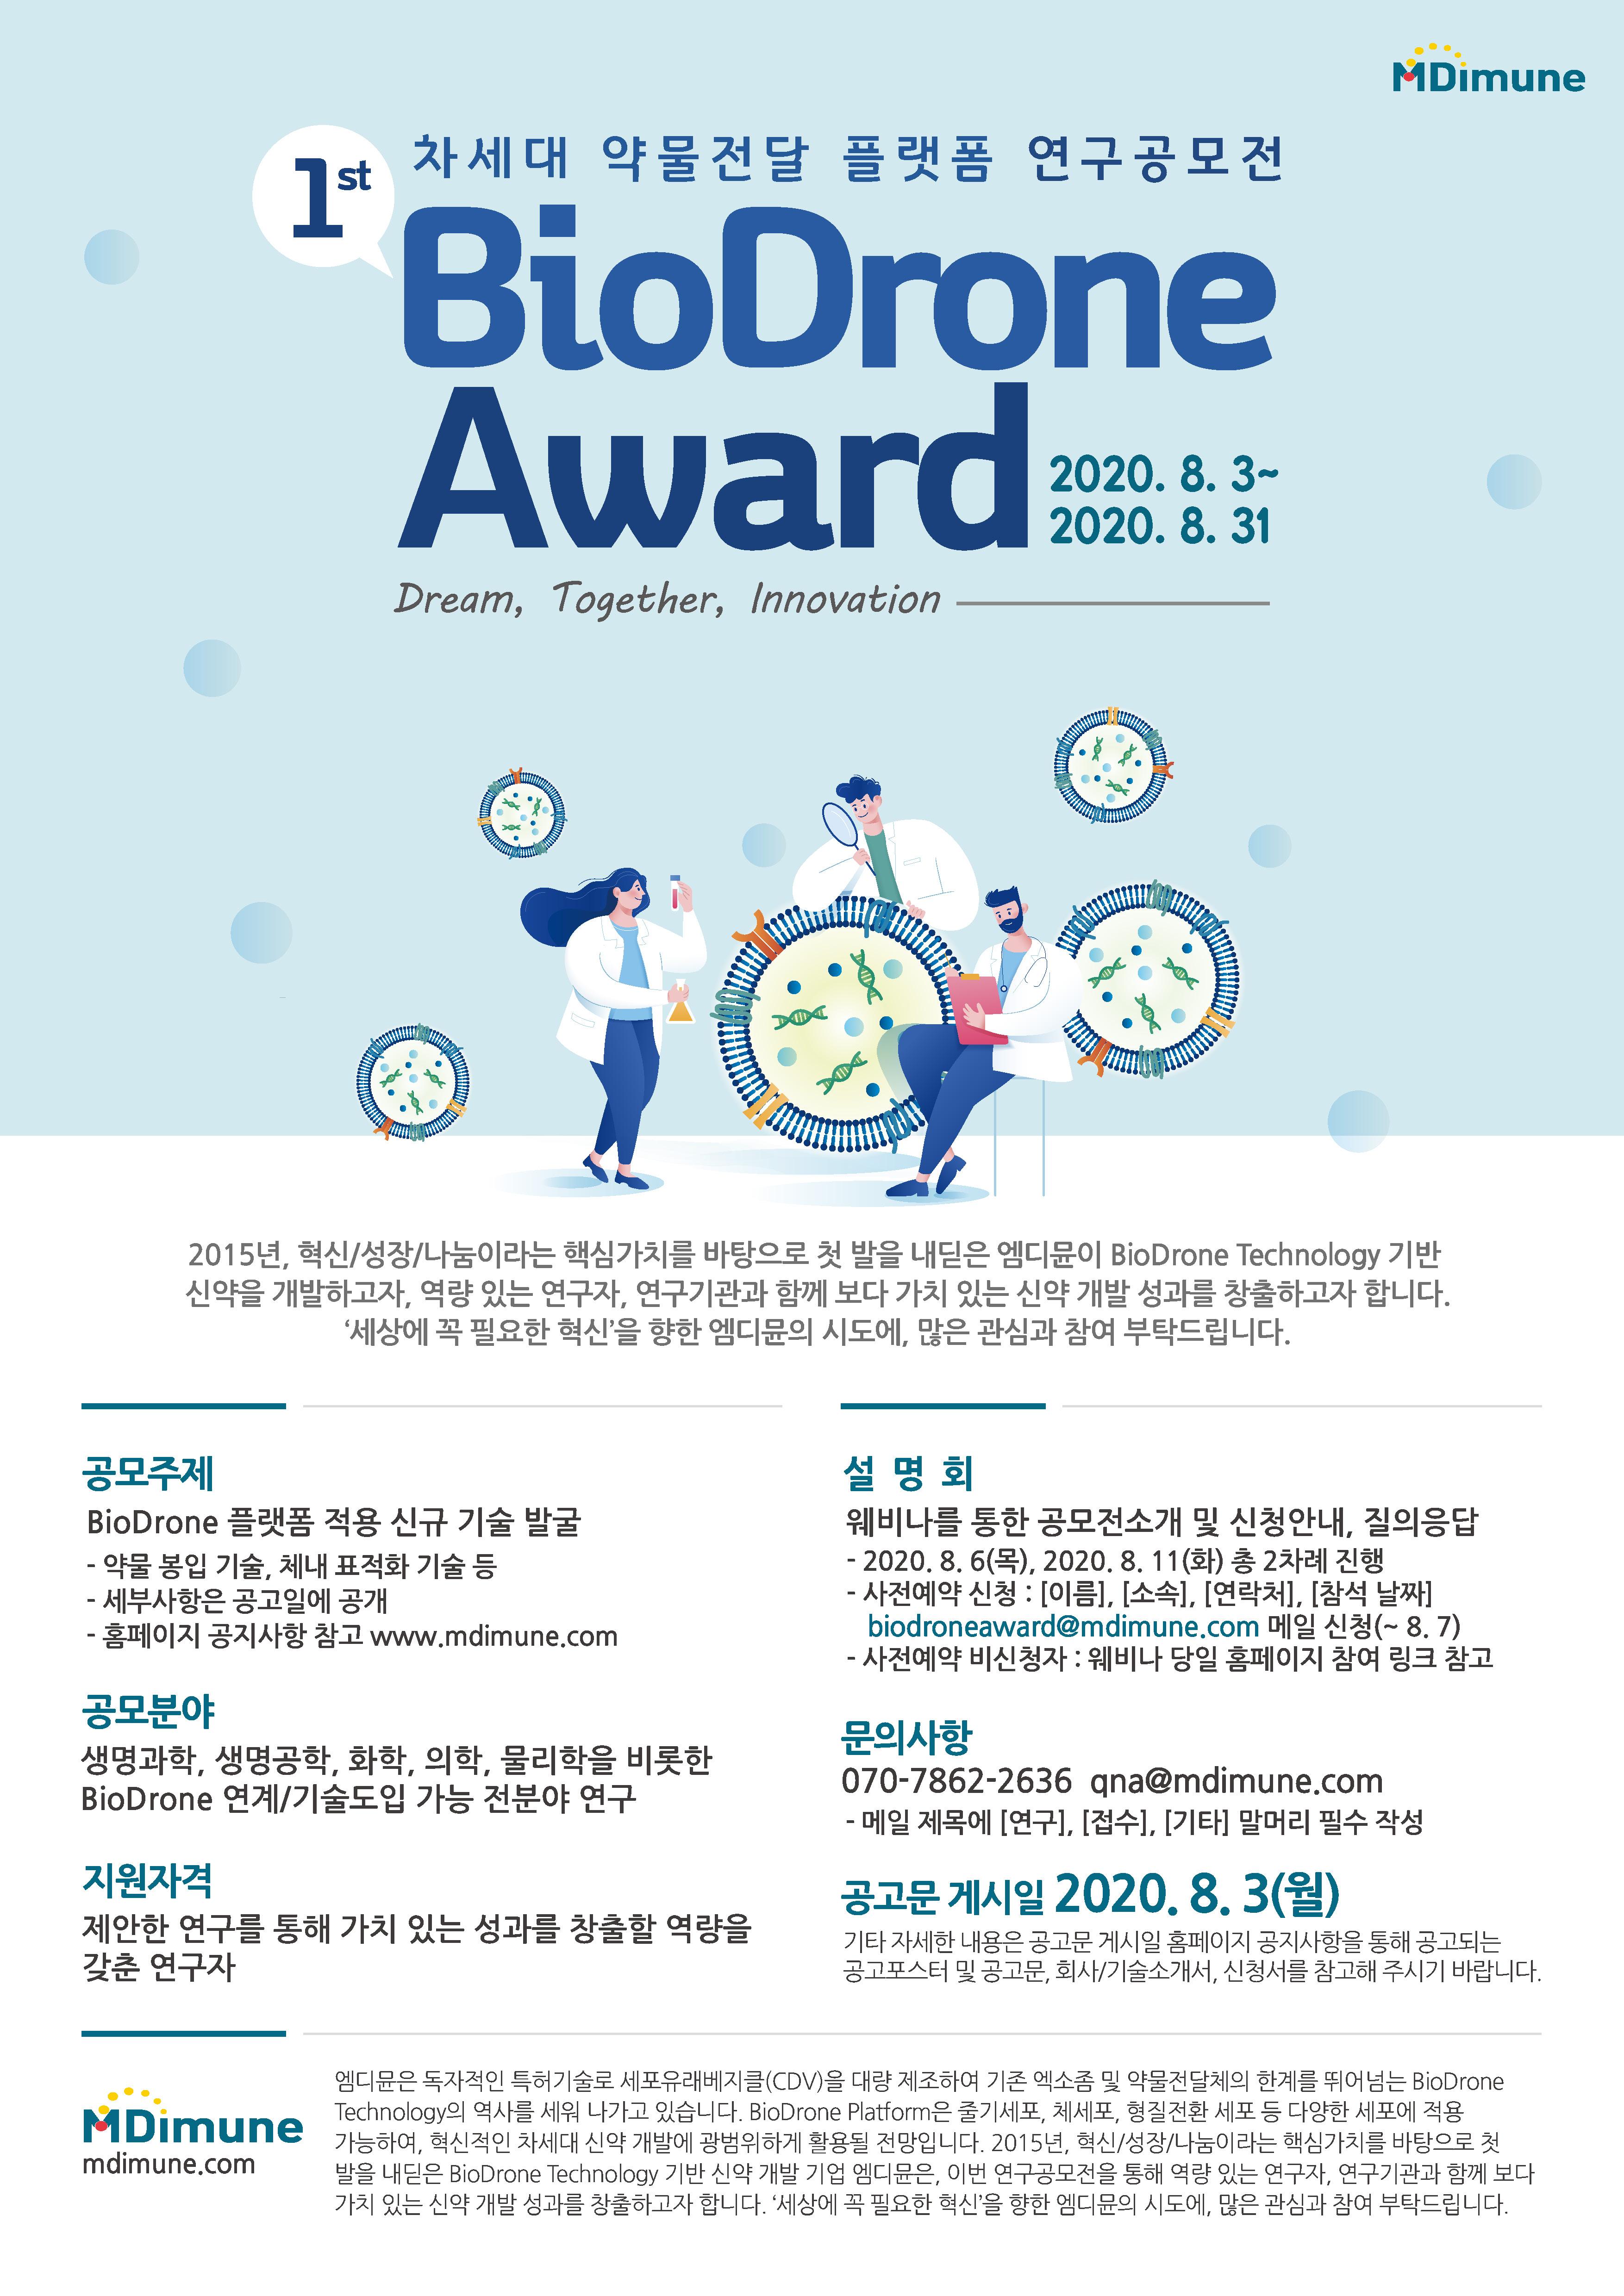 1st BioDrone Award